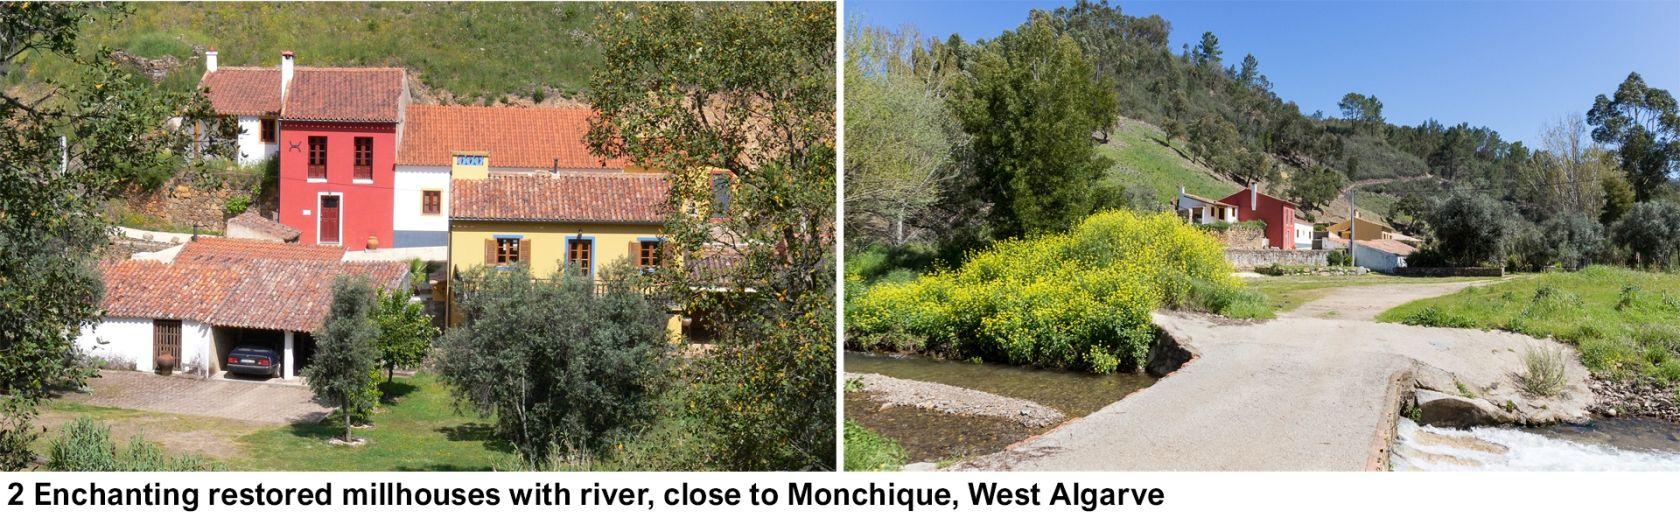 LG1082 -2 Enchanting restored millhouses with river, close to Monchique, West Algarve